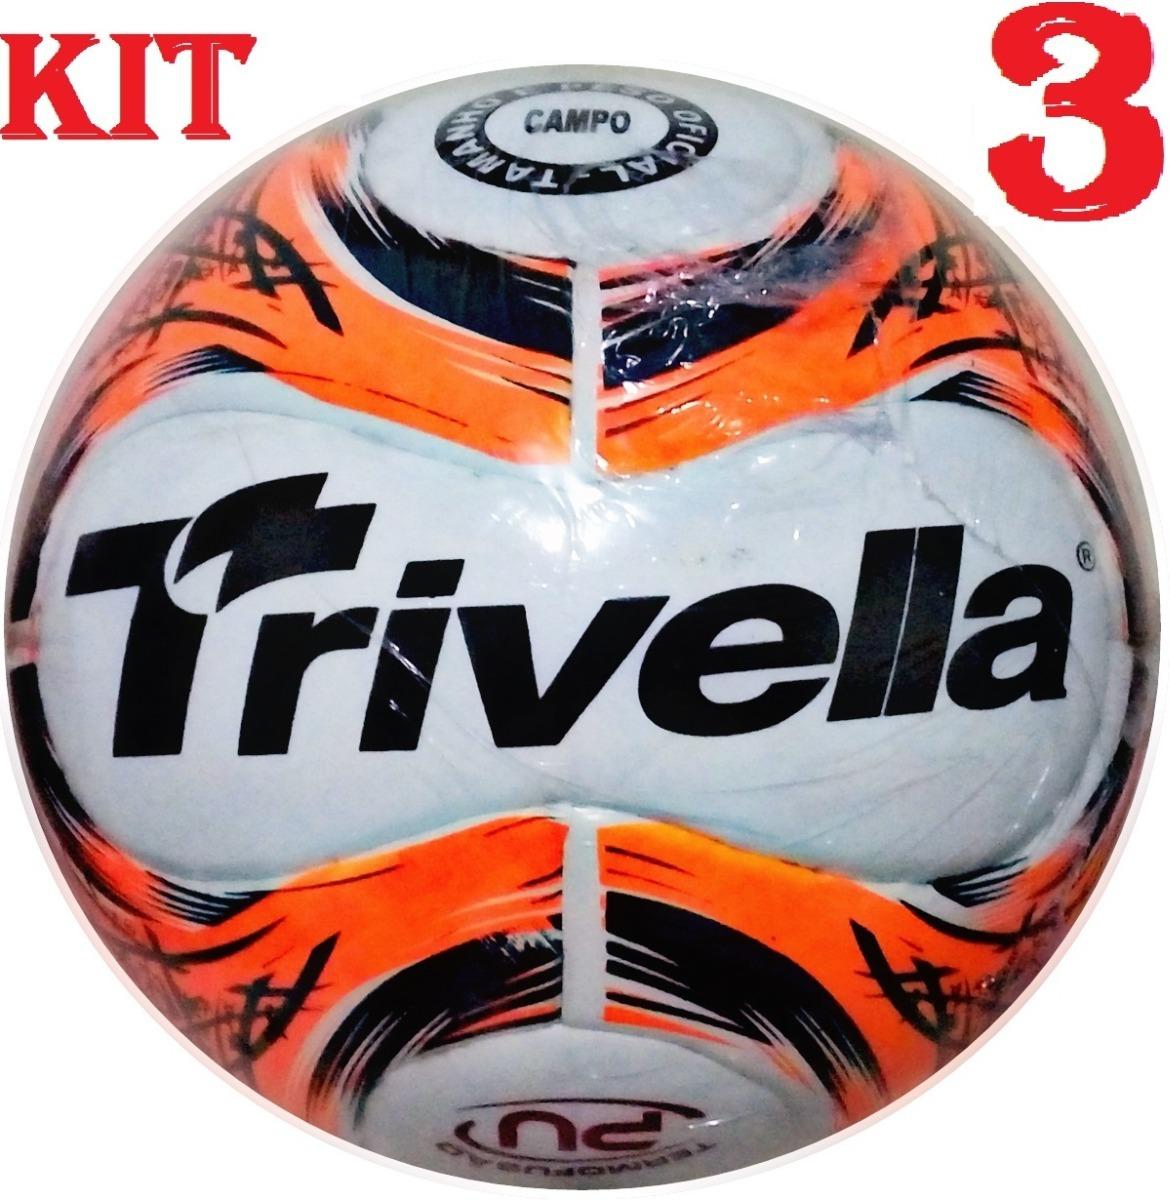 kit 3 bolas futebol campo trivella original - brasil gold. Carregando zoom. f2eb869c573ee